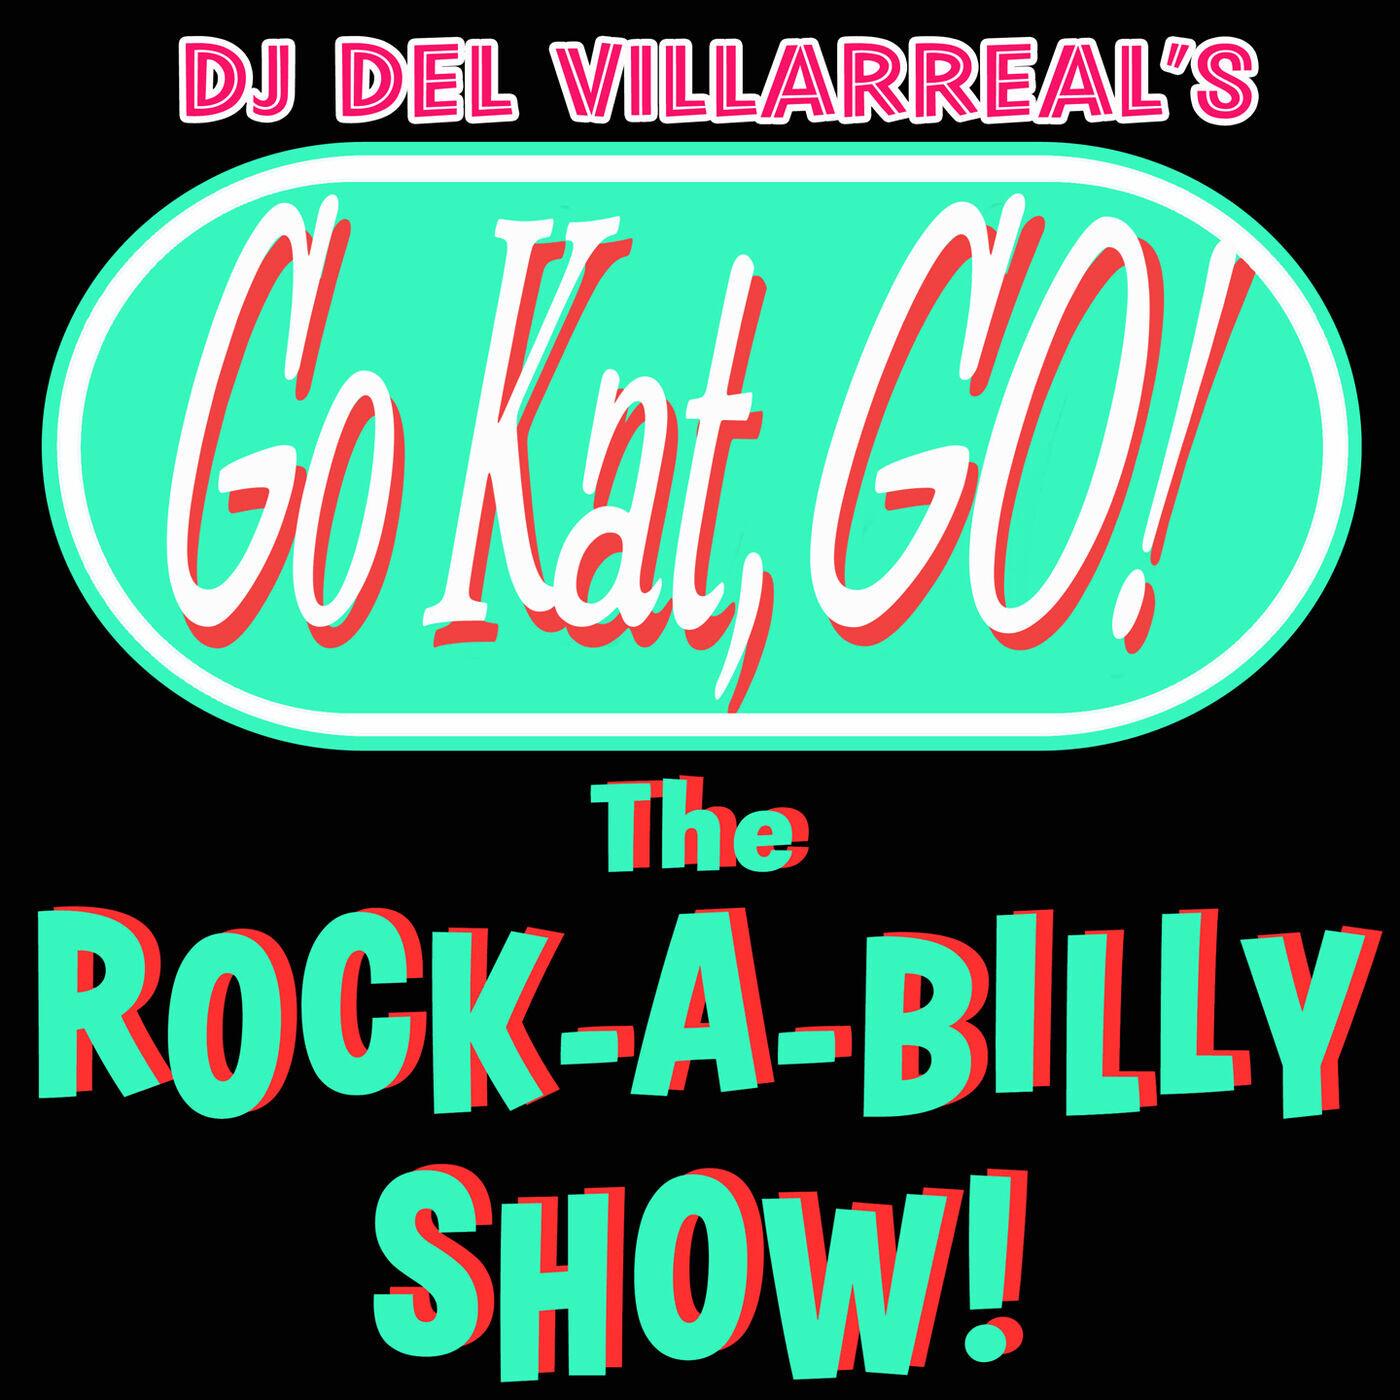 Go Kat, GO! The Rock-A-Billy Show! 10.15.20